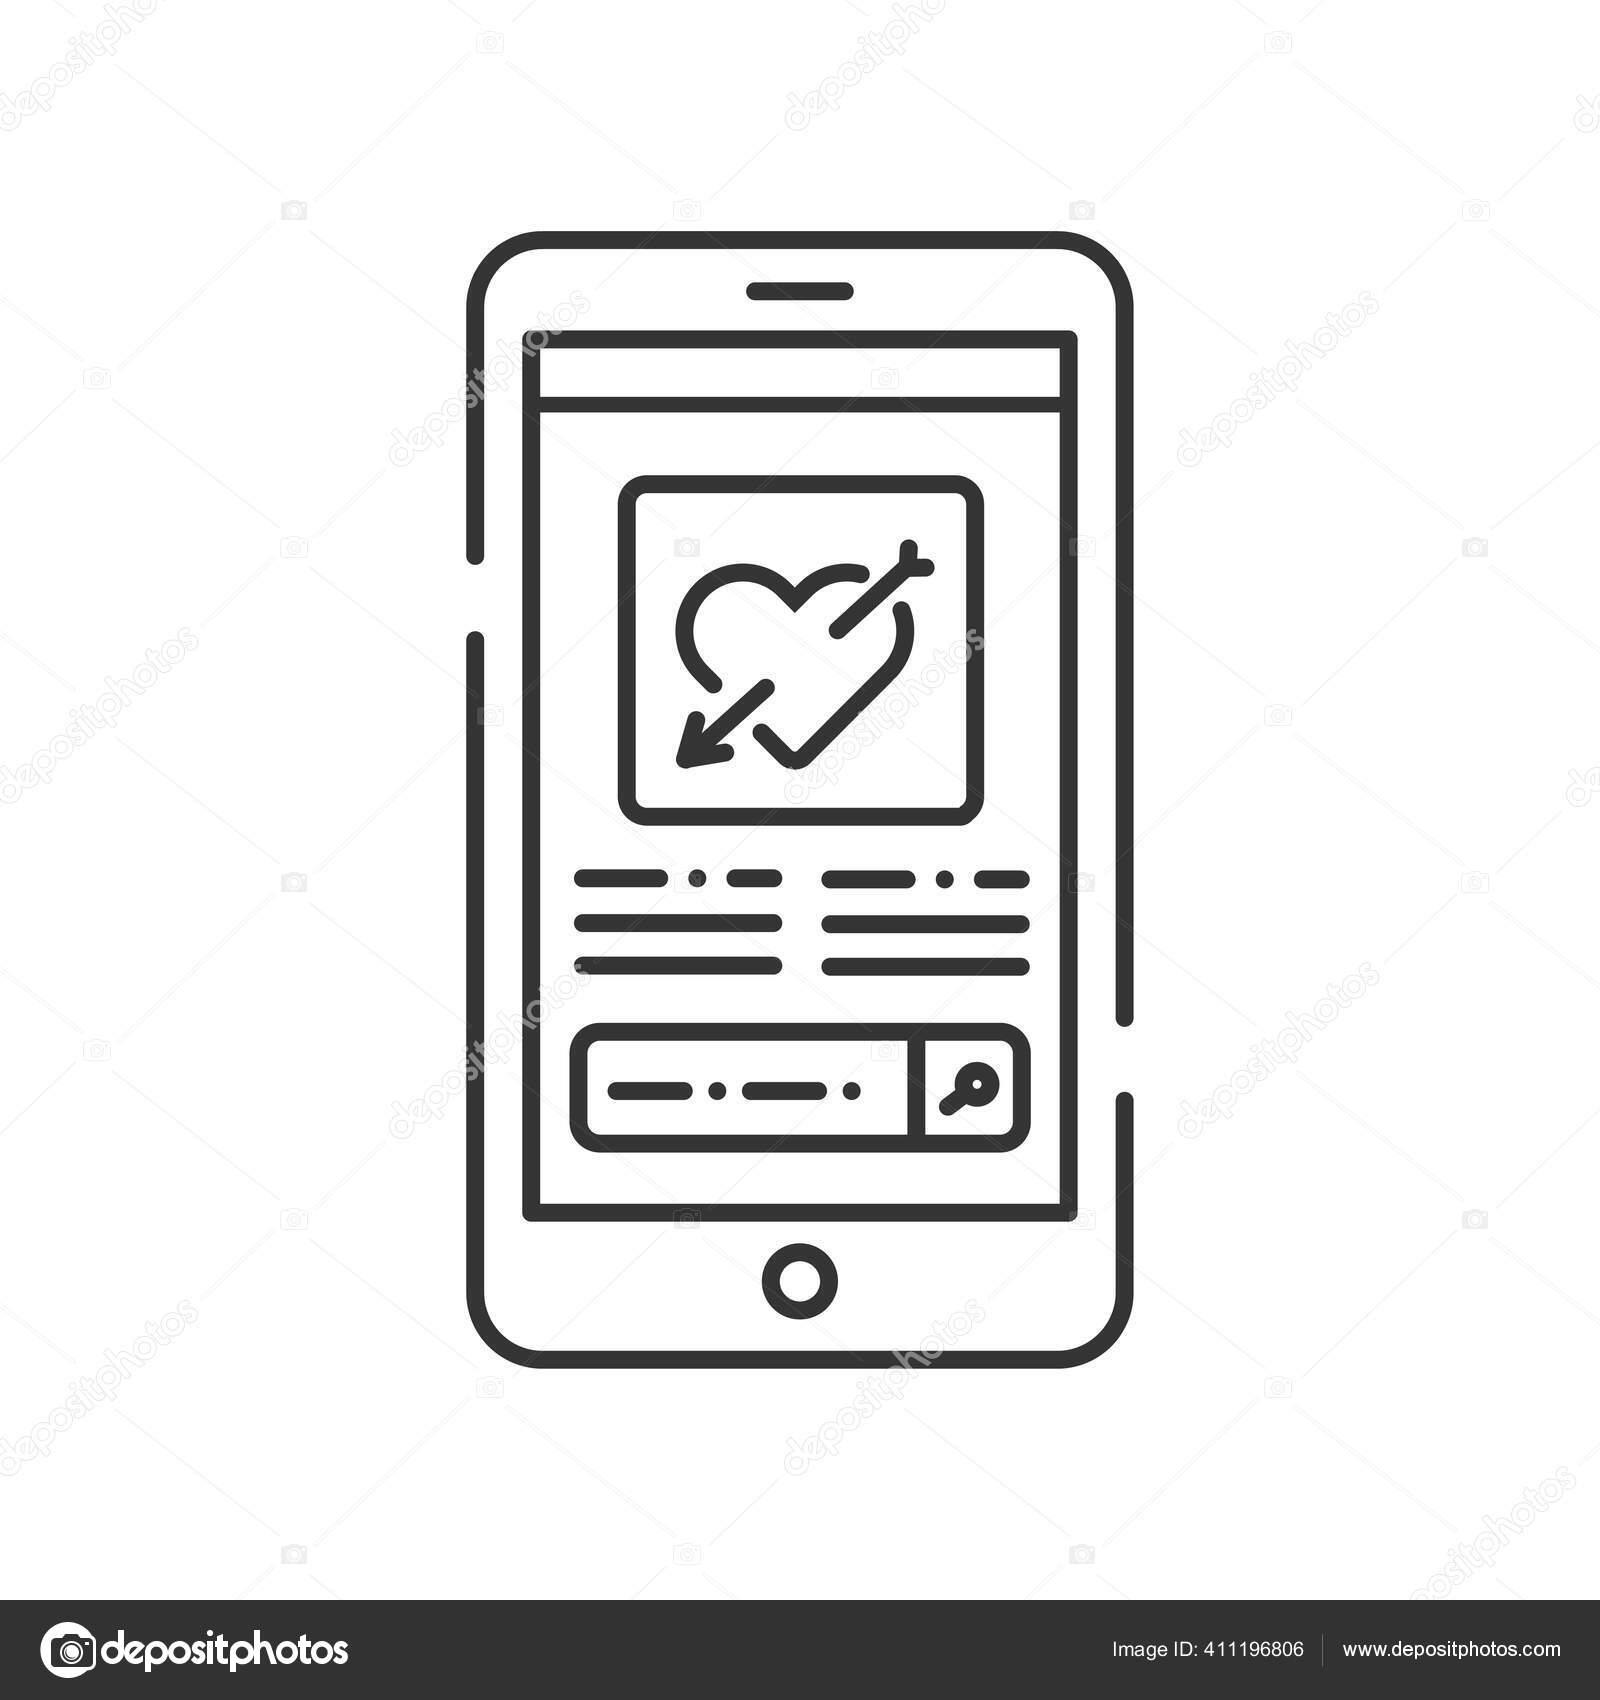 telefon dating line fata de dating probleme